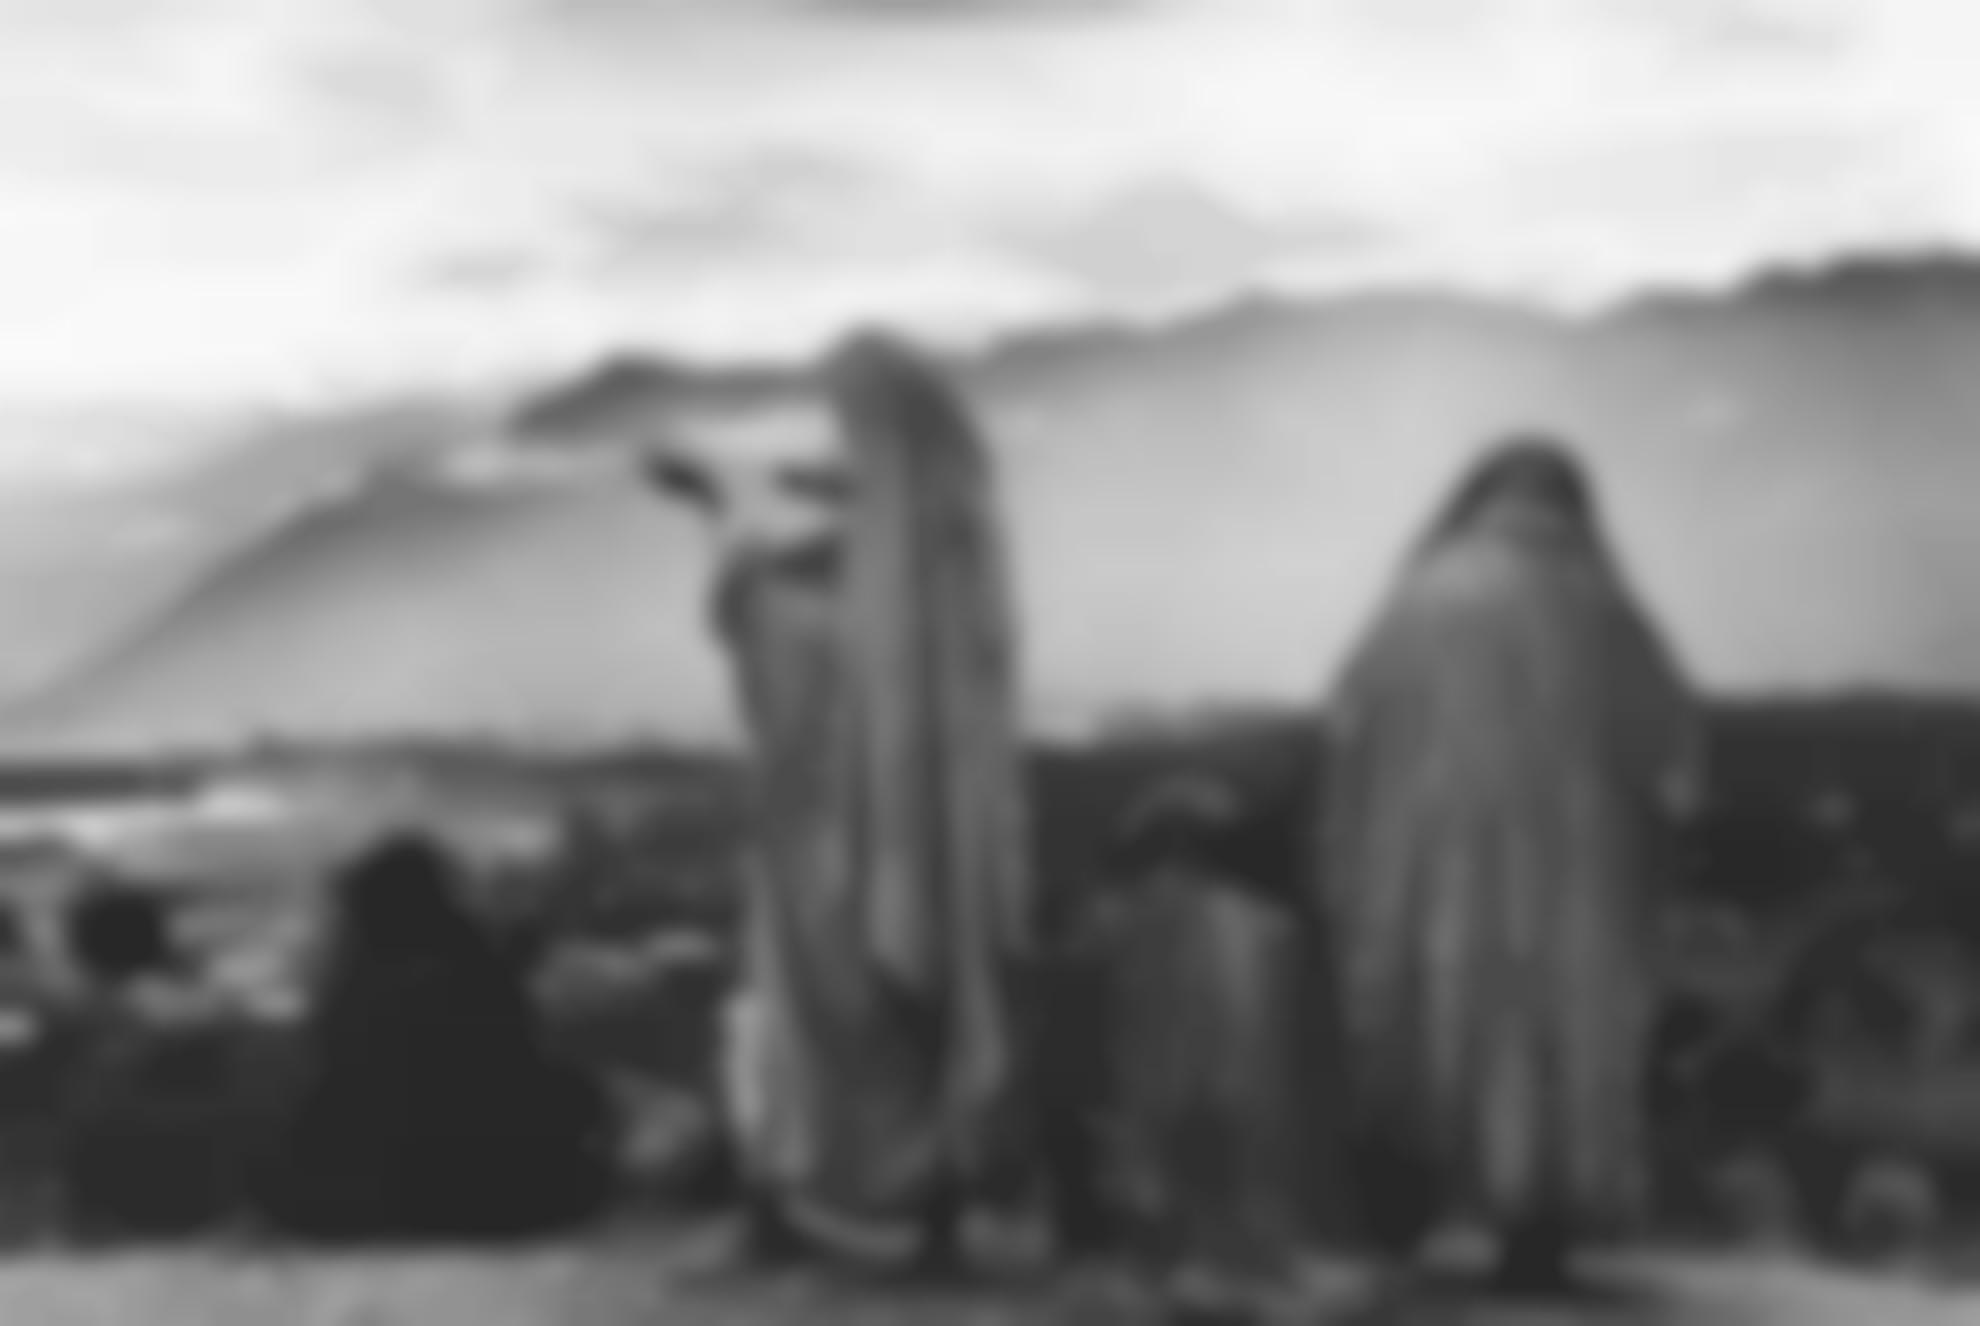 Henri Cartier-Bresson-Srinagar, Kashmir, India-1948